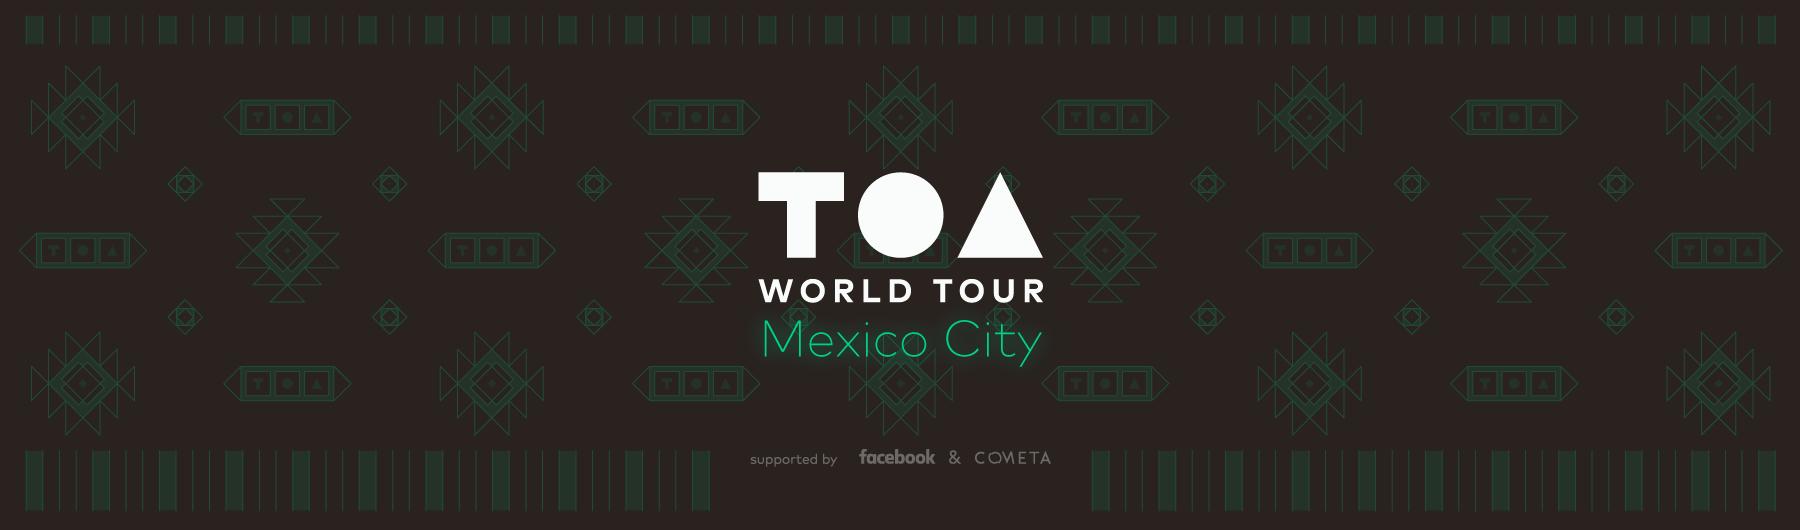 TOA WorldTour: Mexico City